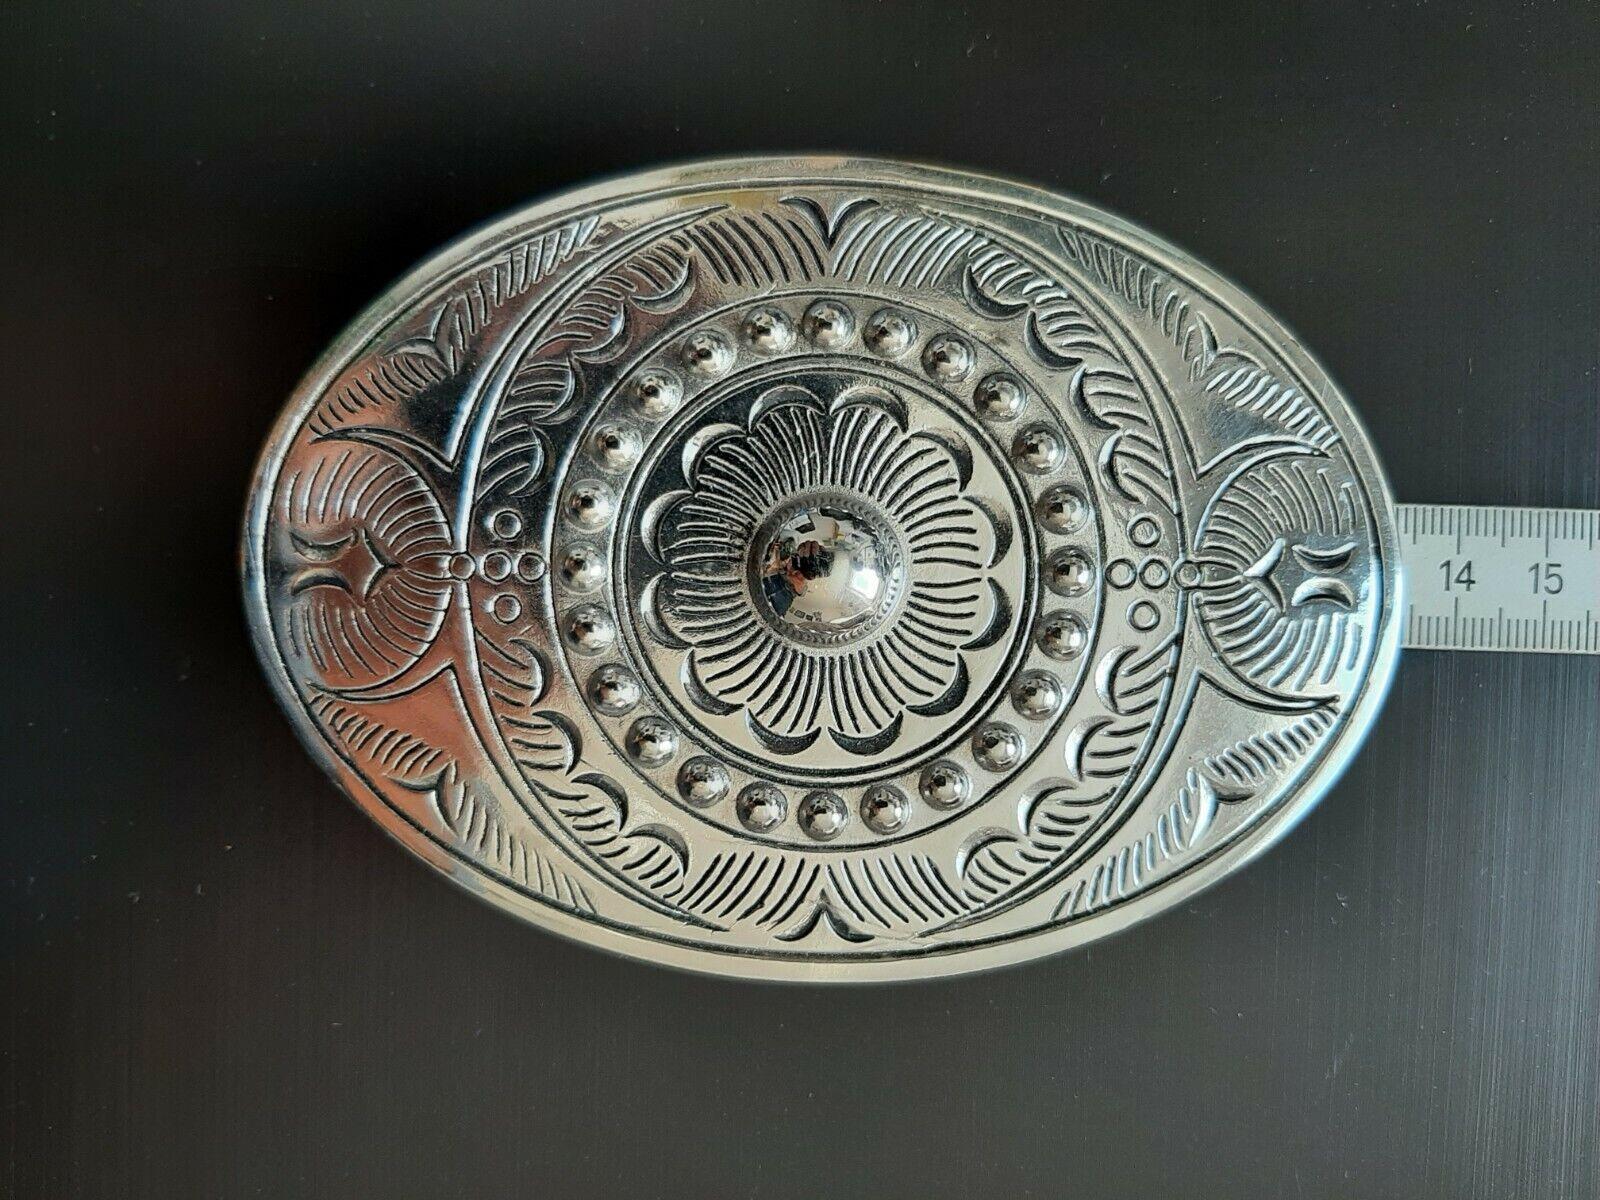 Buckle Gürtelschnalle silver oval groß